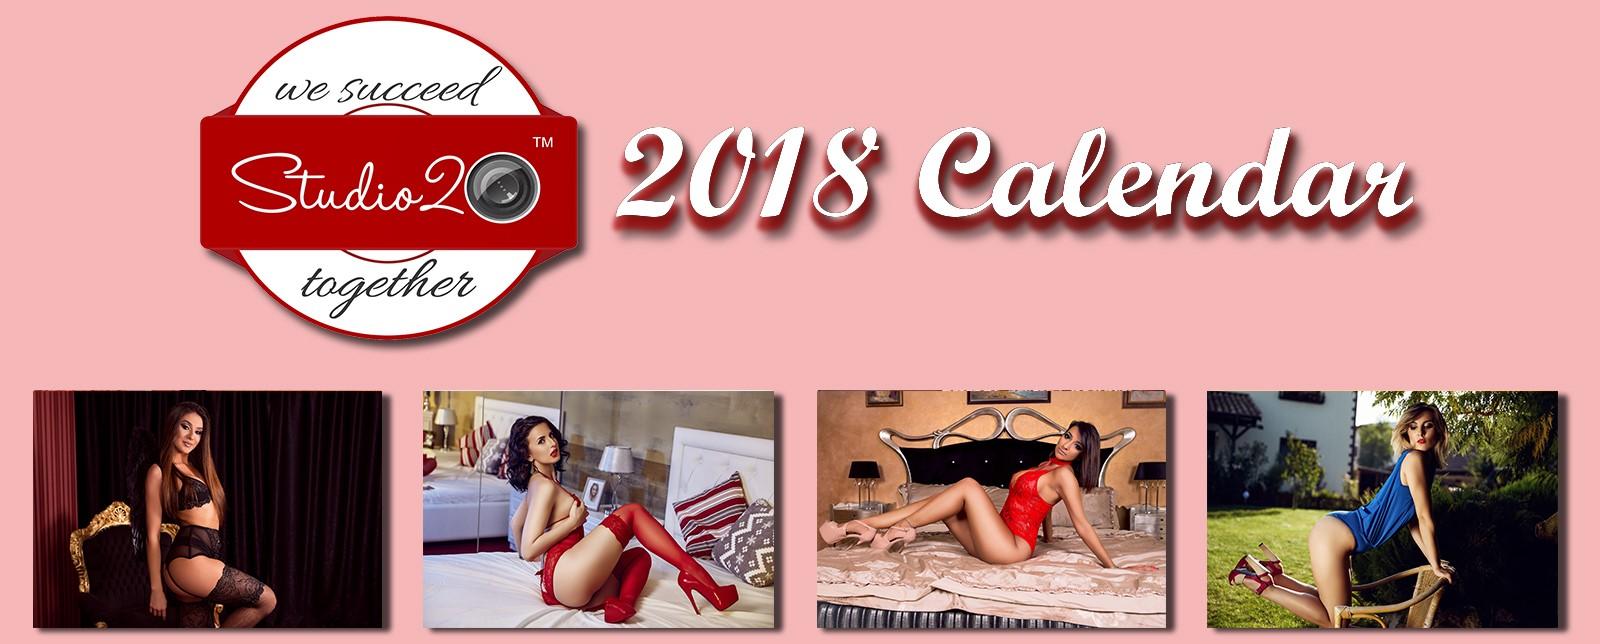 Studio20 Announces Christmas Calendar With Top Models